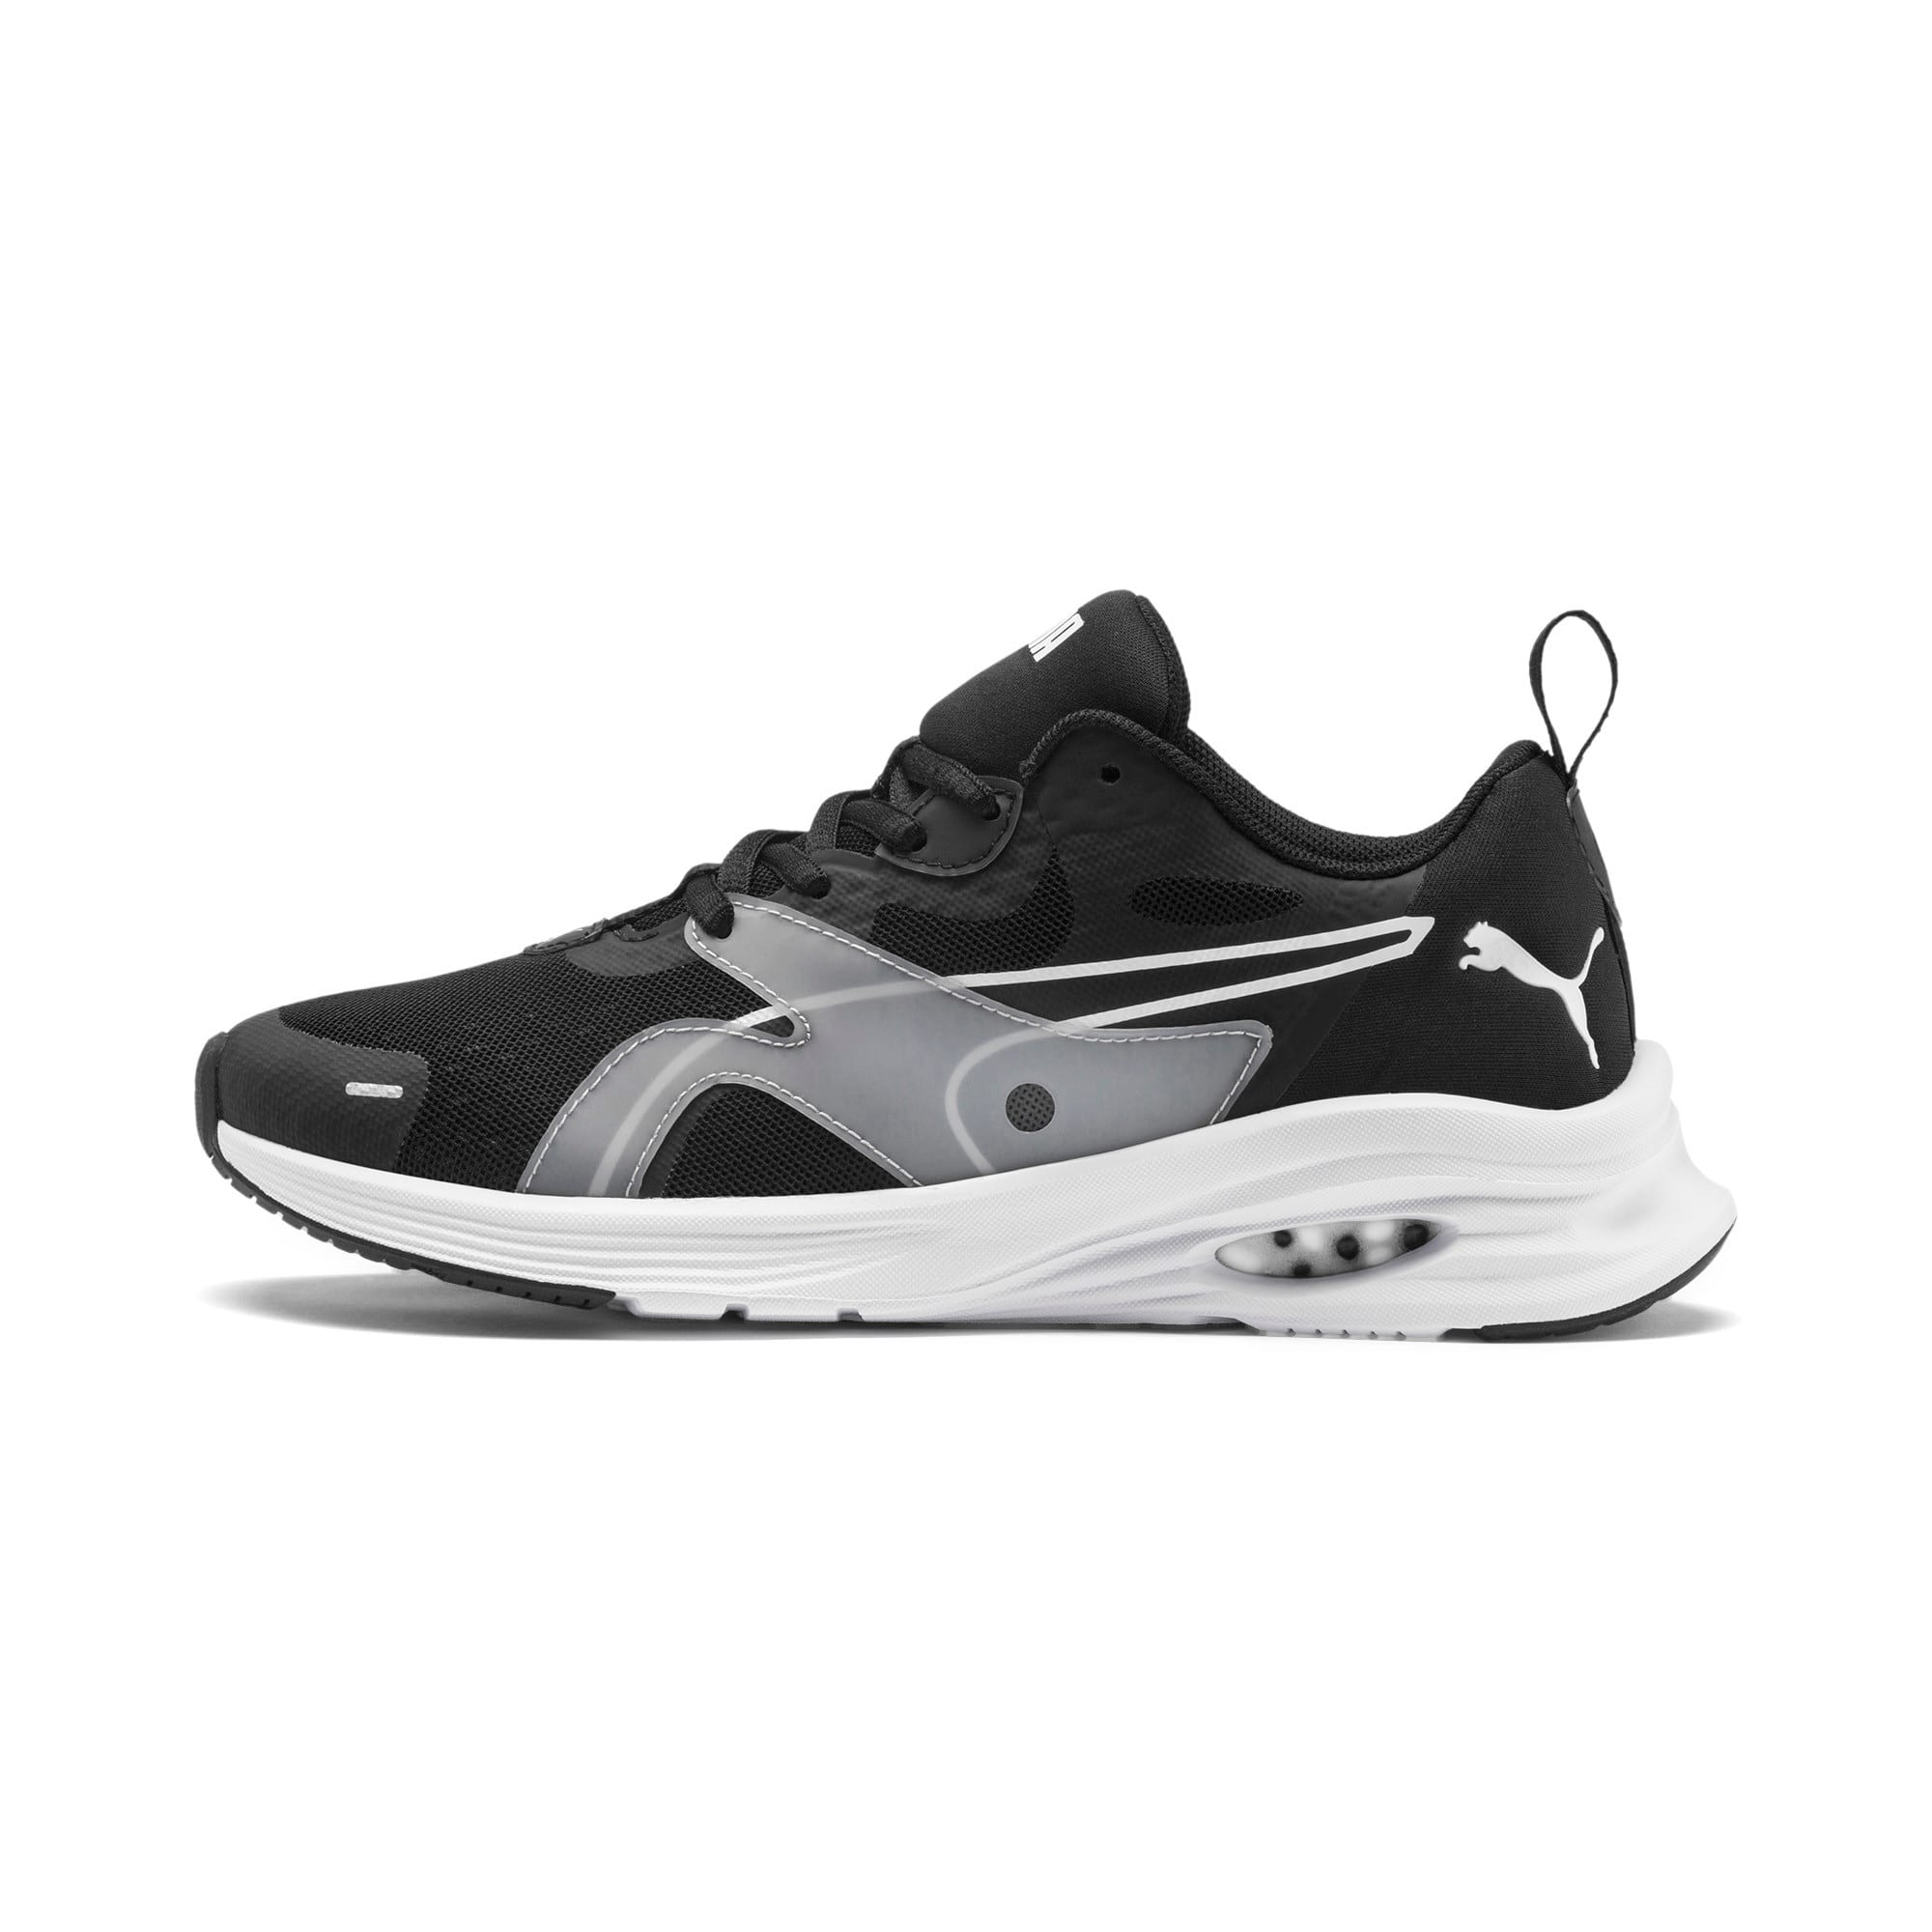 Thumbnail 1 of HYBRID Fuego Running Shoes JR, Puma Black-Puma White, medium